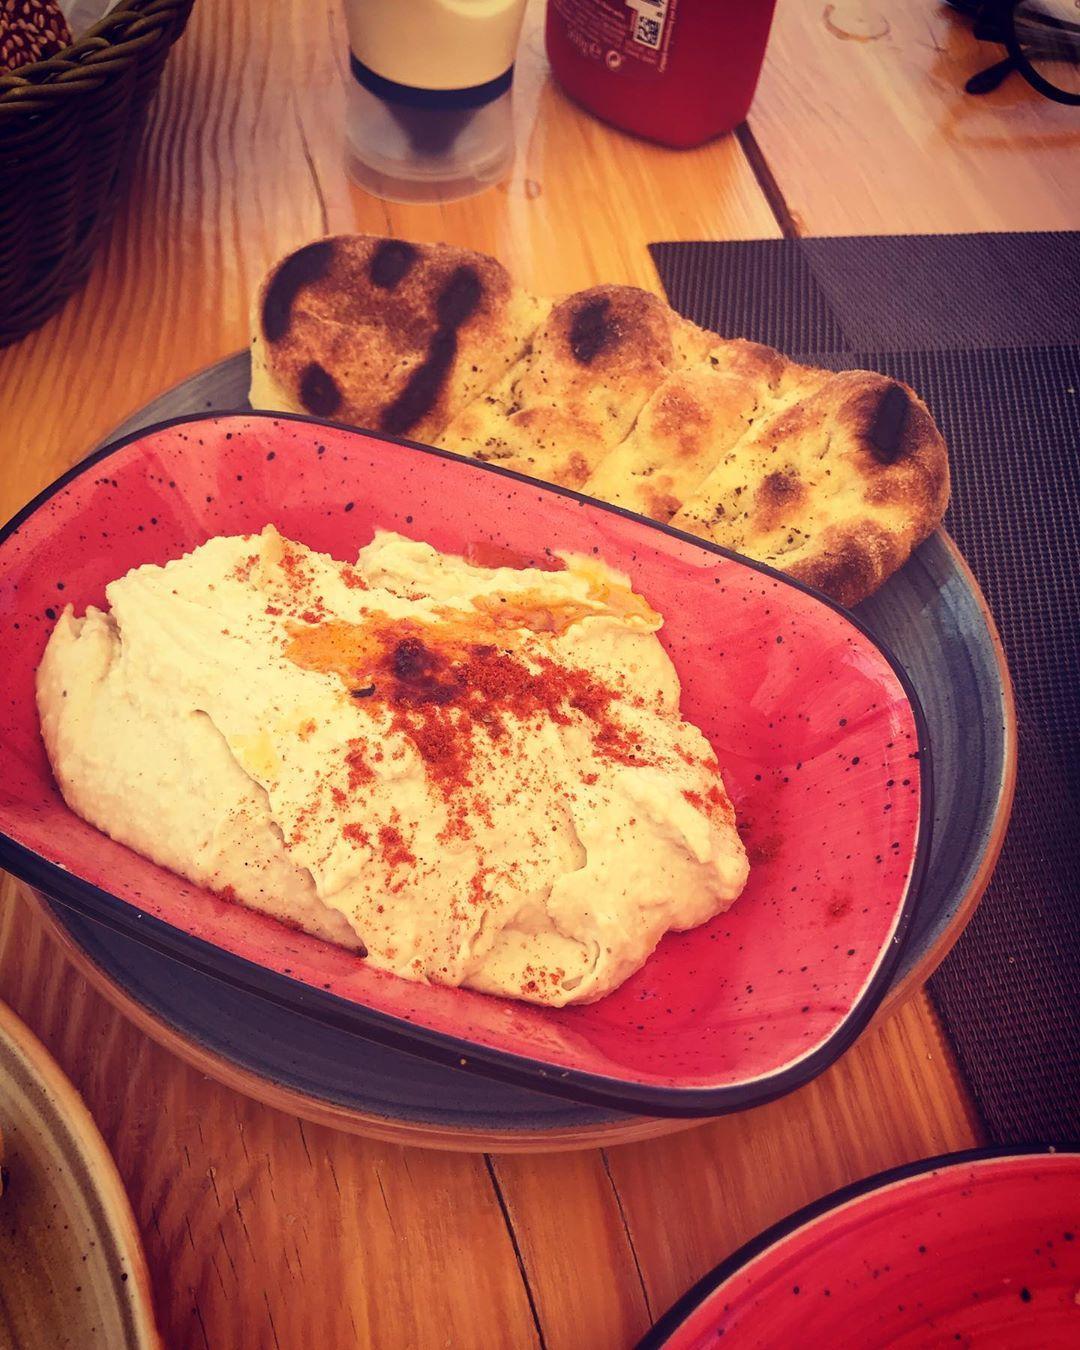 Amazing hummus and pita in Greece 🇬🇷 . . . .  #vegan #veganfood #plantbased #healthy #food #whatvega...